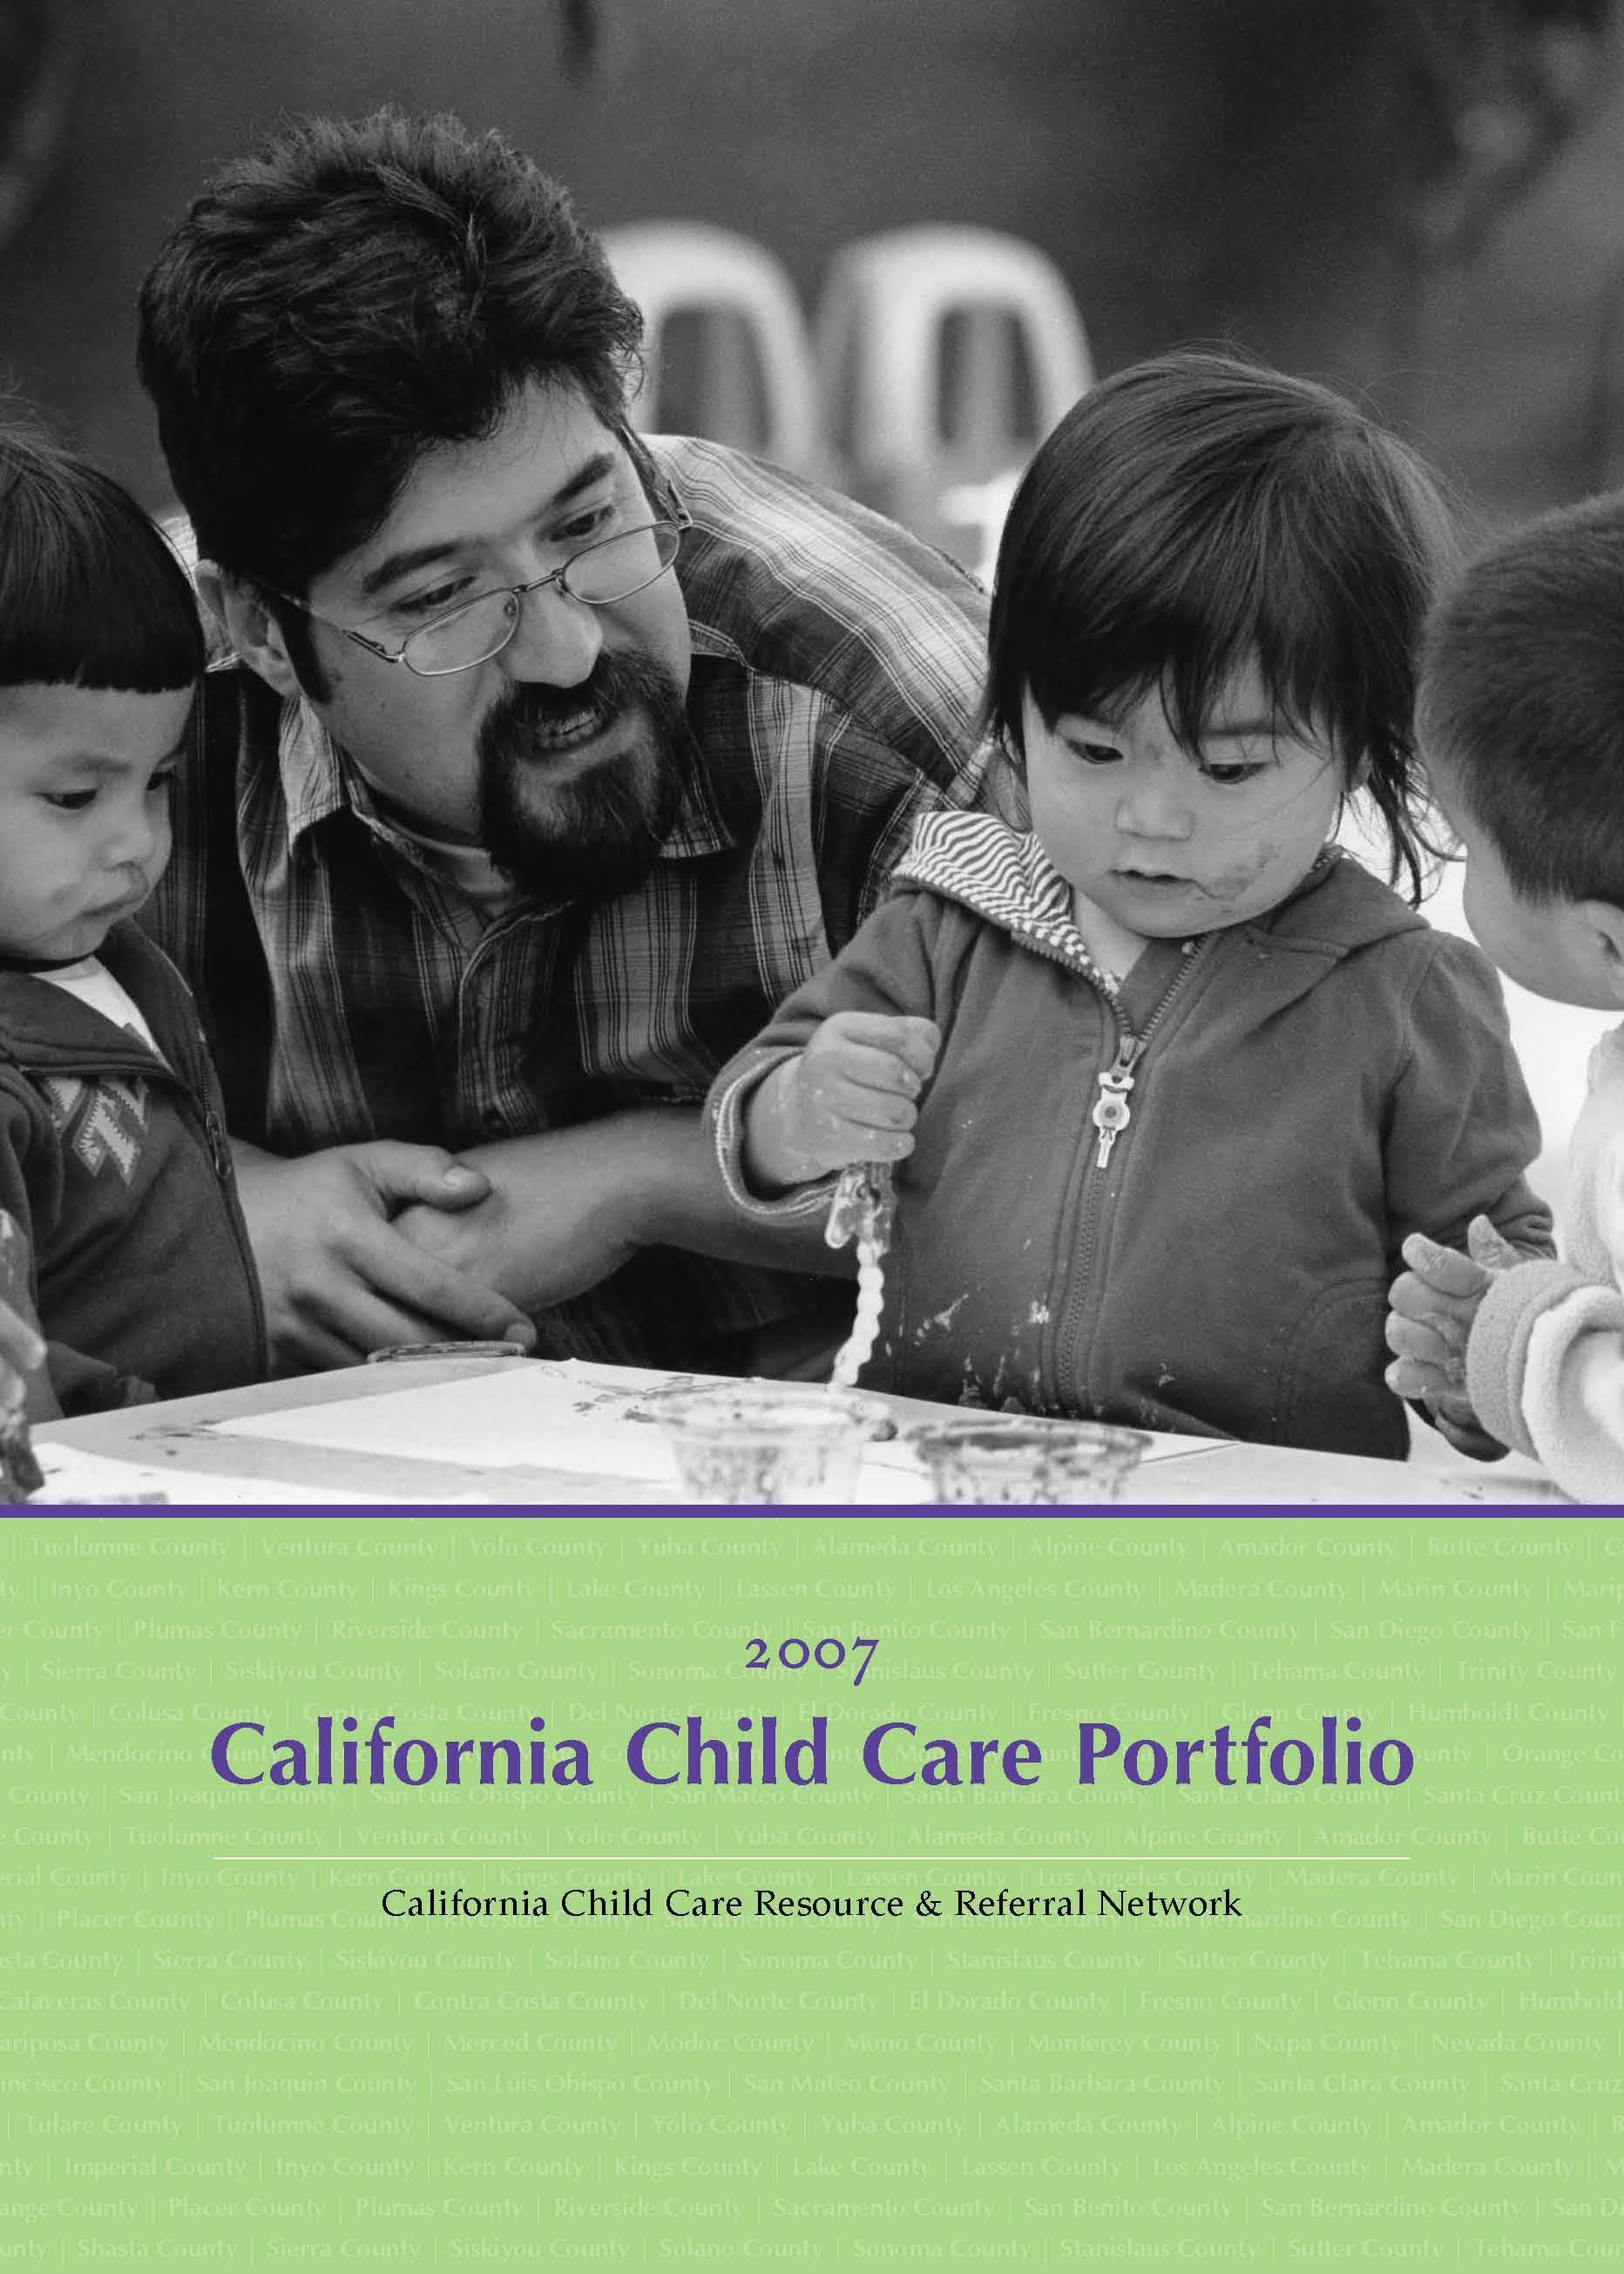 2007 portfolio cover